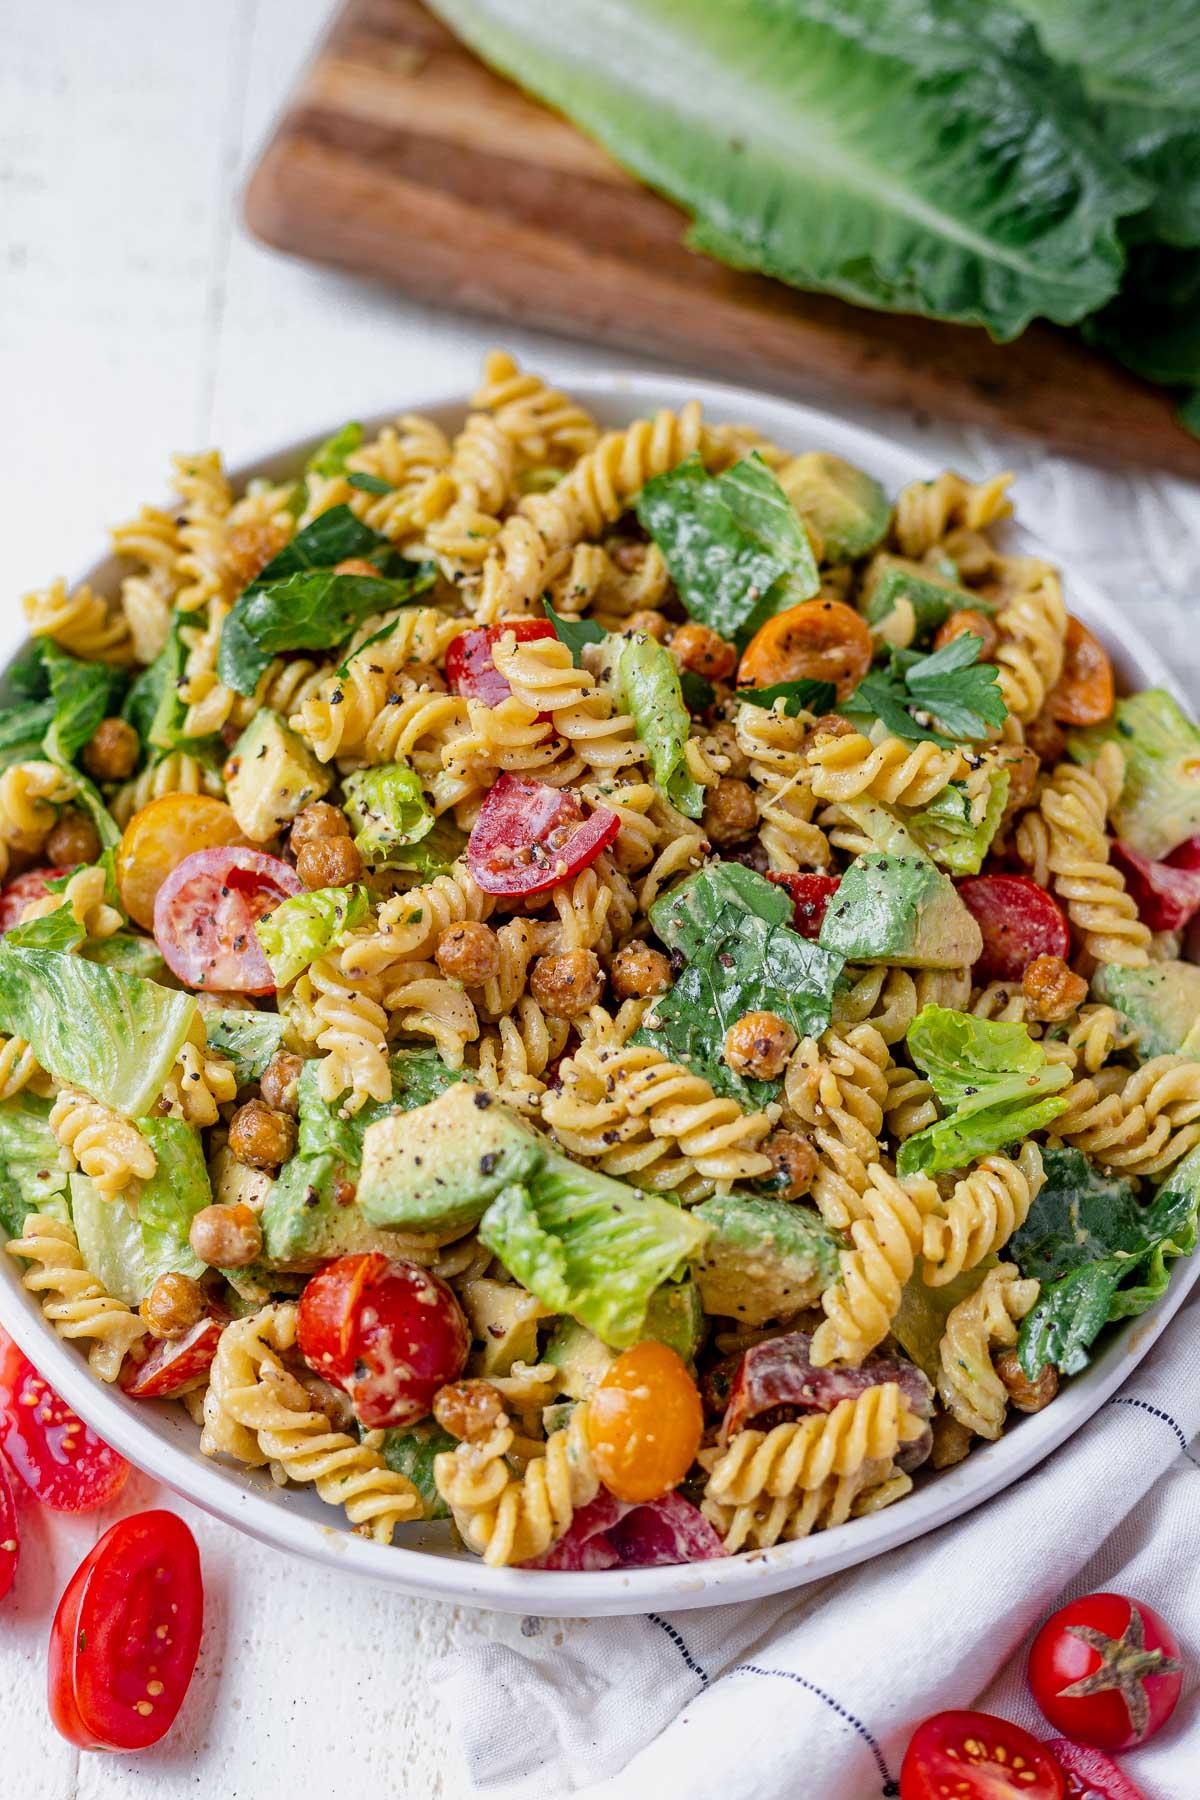 caesar pasta salad with rotini, lettuce, tomato and chickpeas